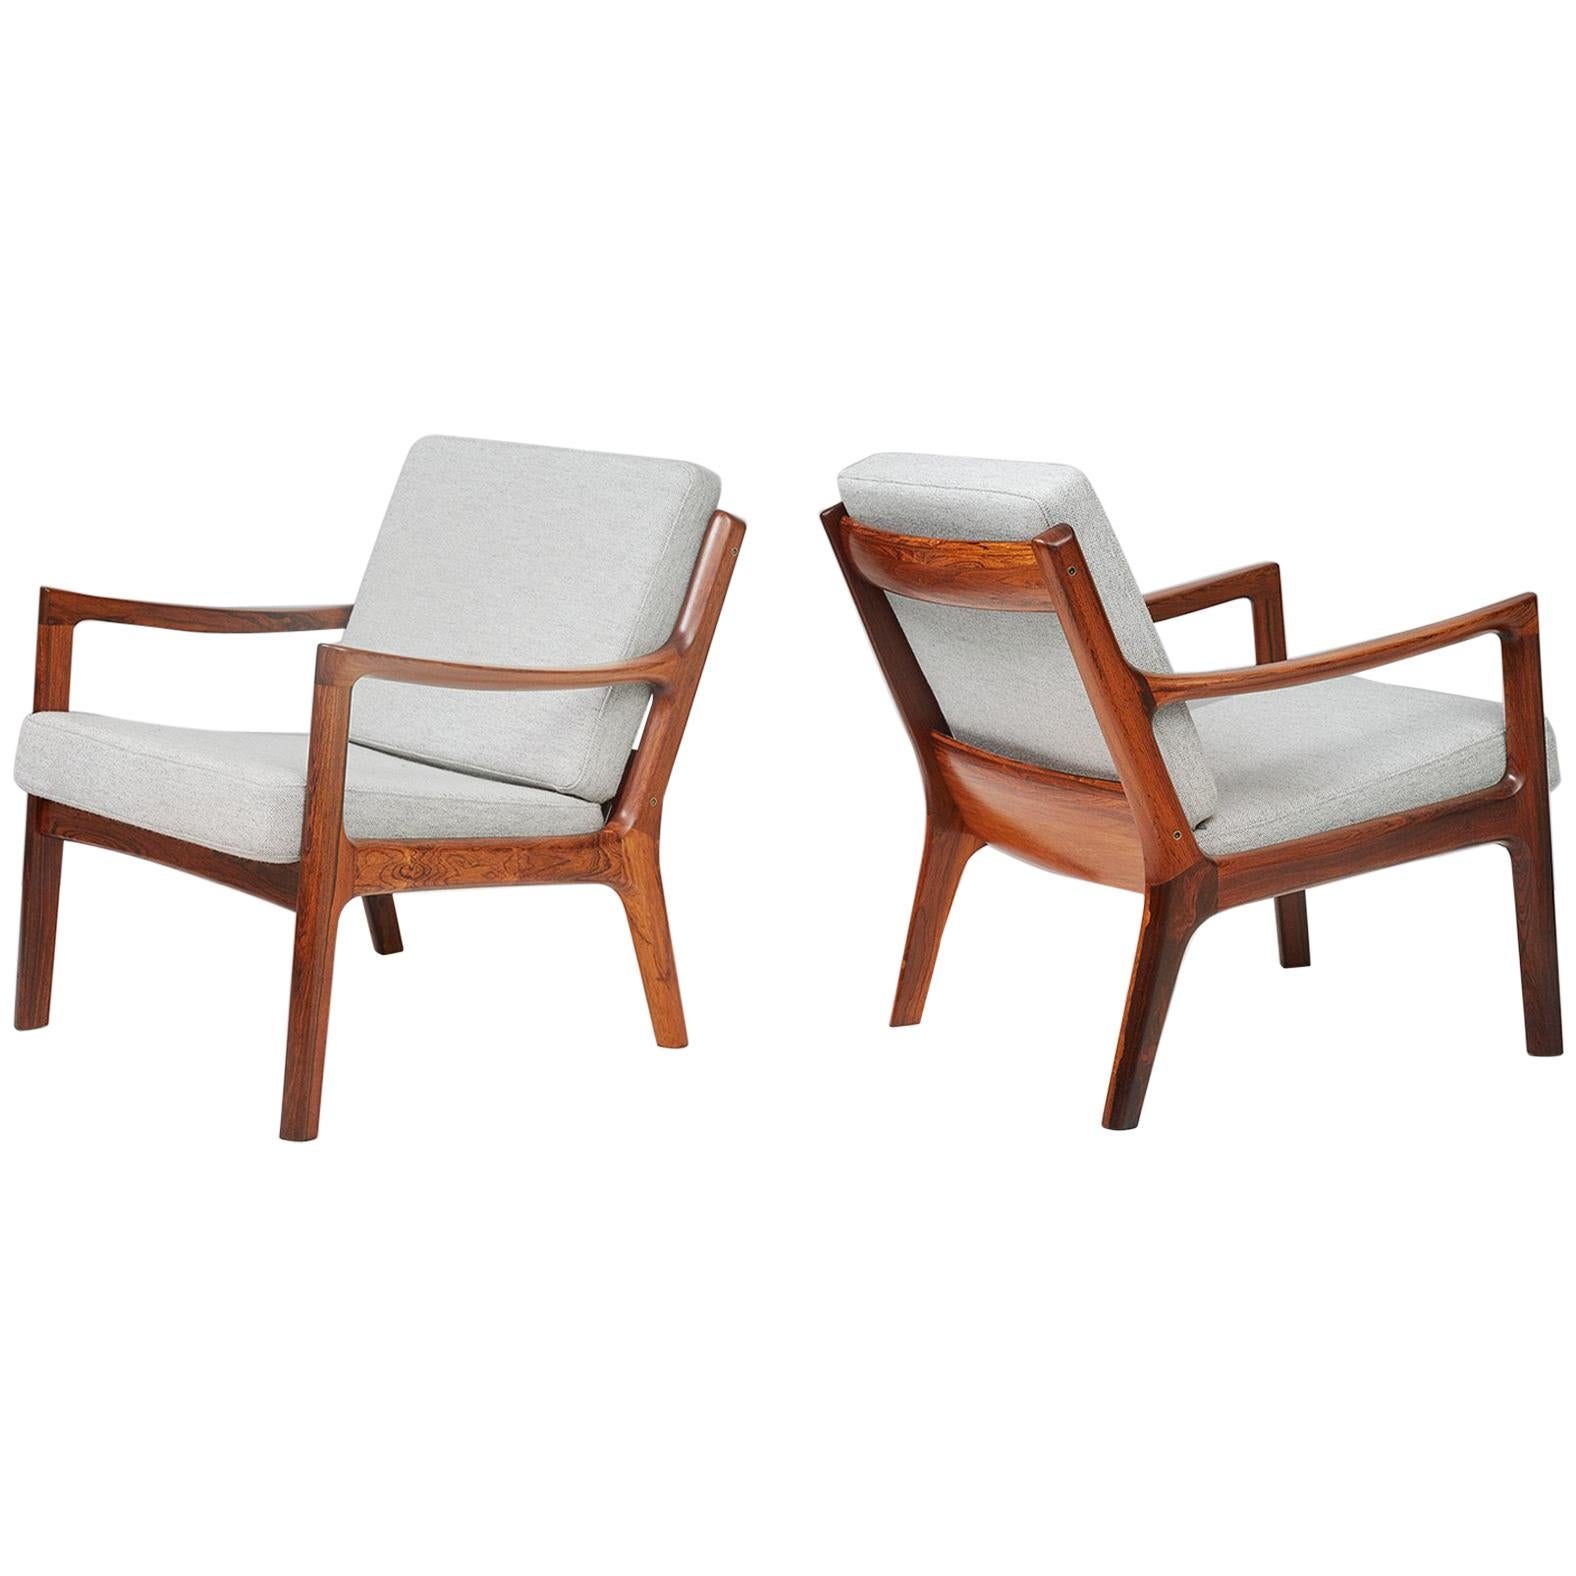 Ole Wanscher Senator Lounge Chairs, circa 1960